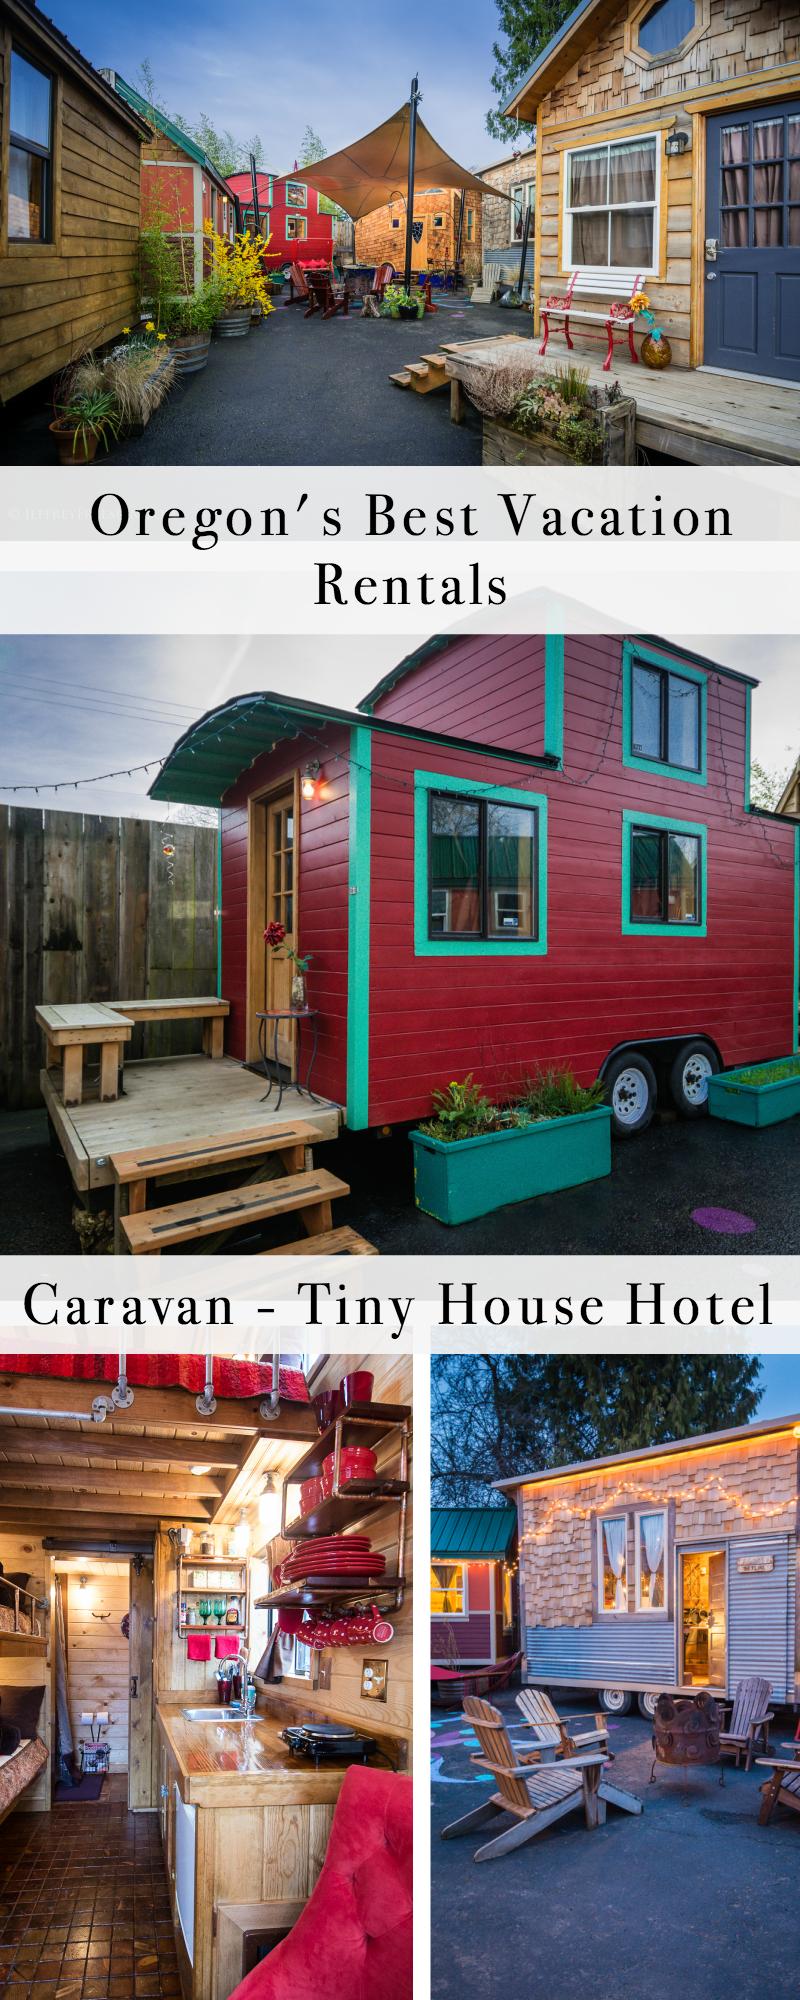 Oregon's Best Vacation Rentals: Caravan Tiny House Hotel 1